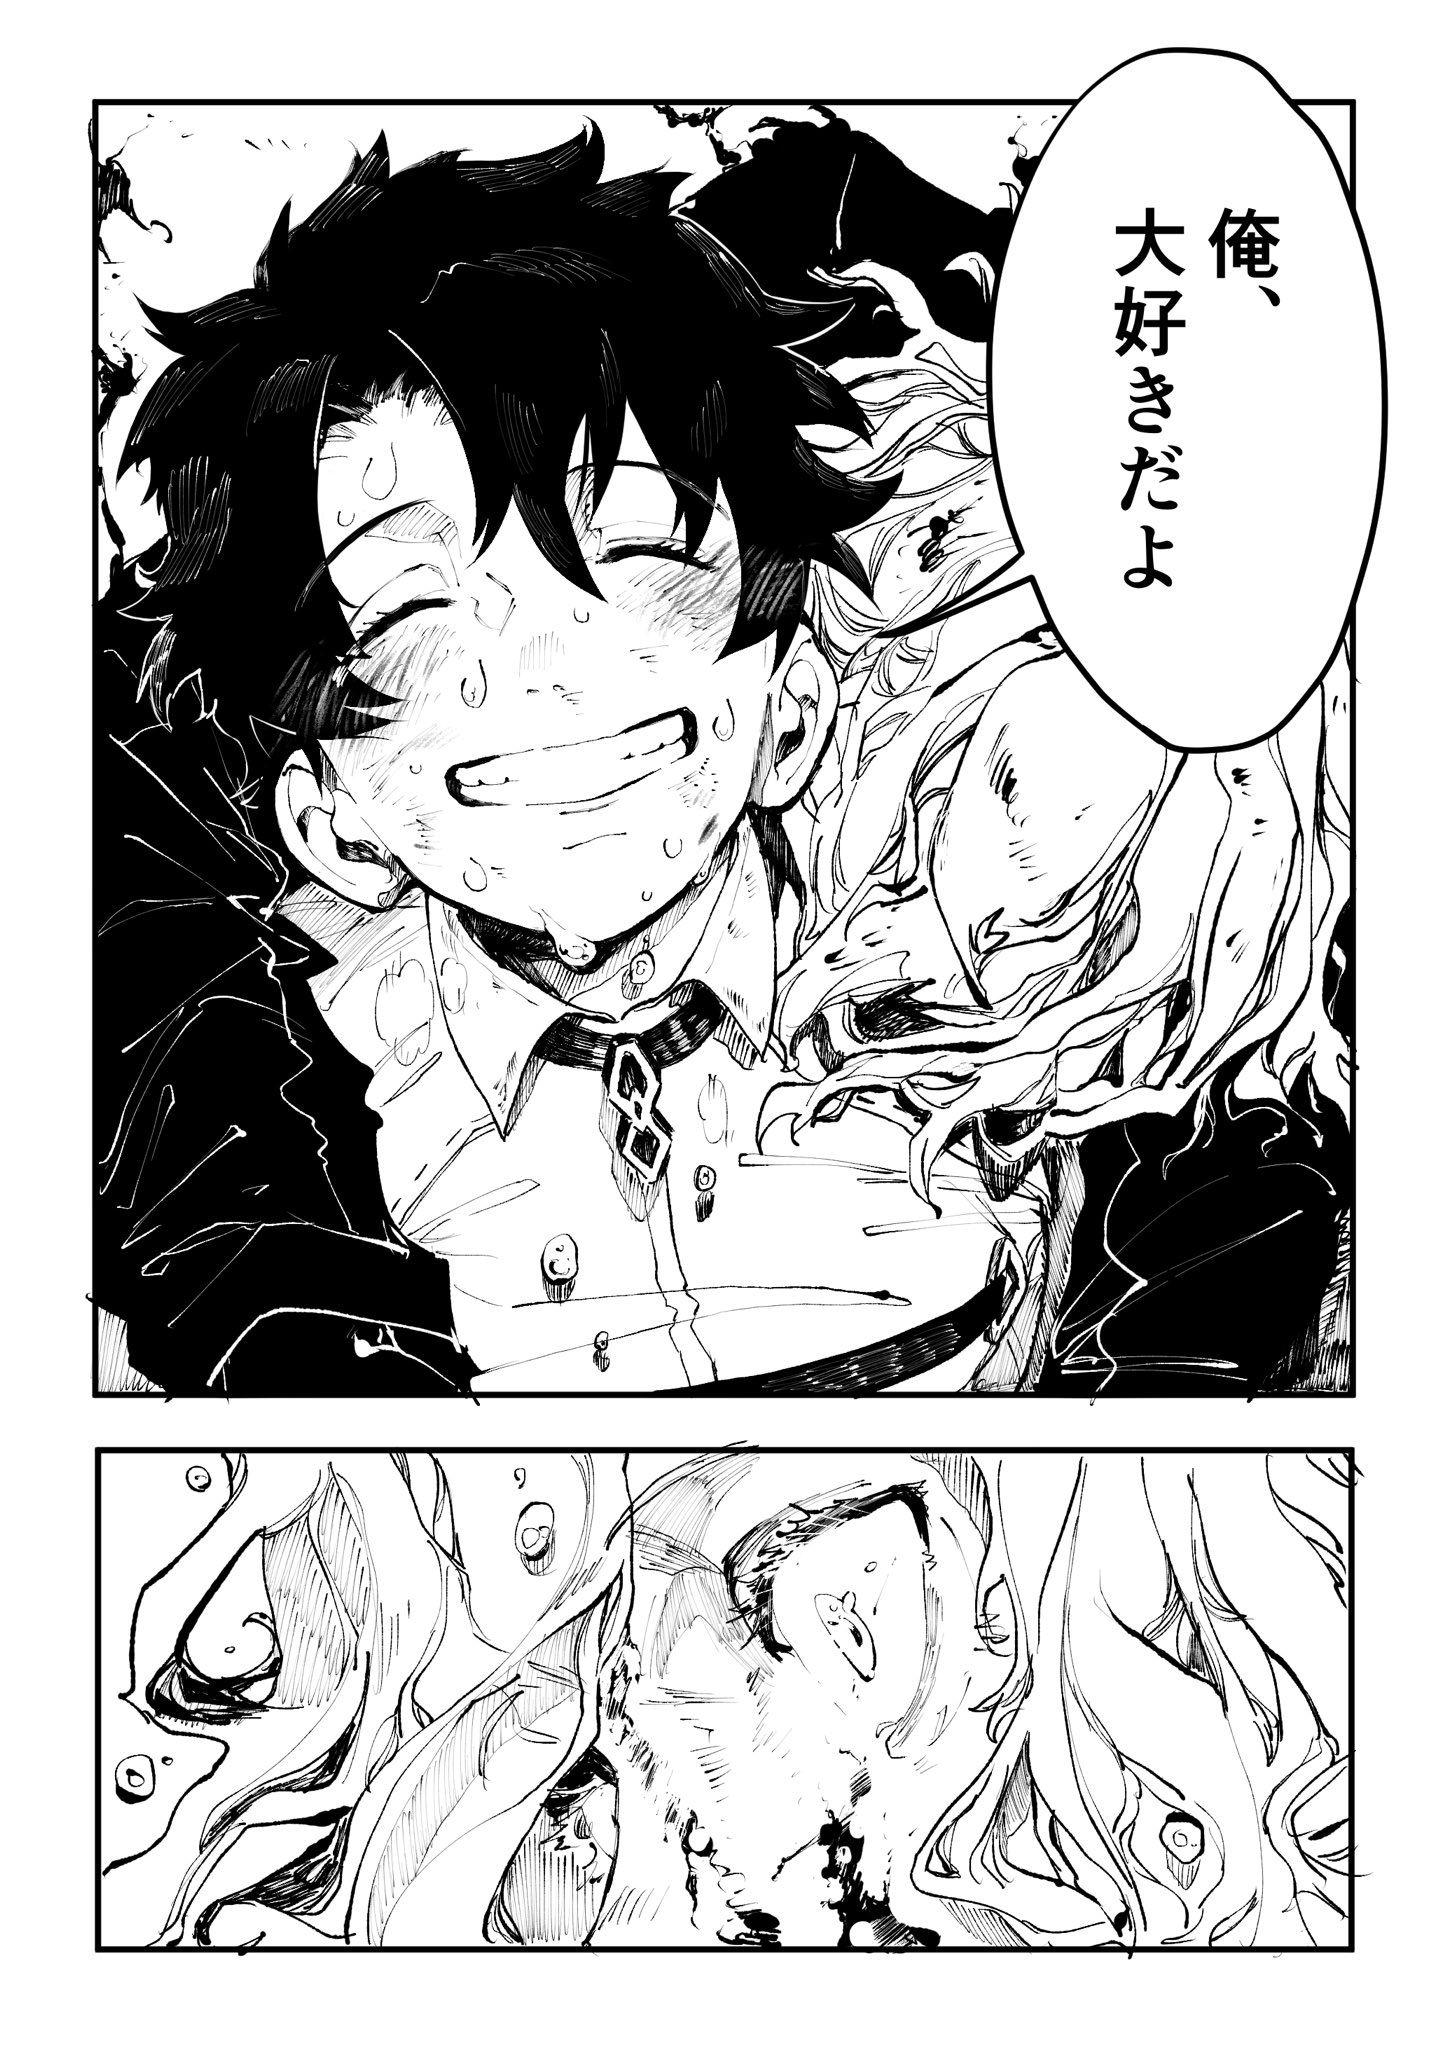 Pin by やーこ on 目 Anime drawings, Manga art, Anime art